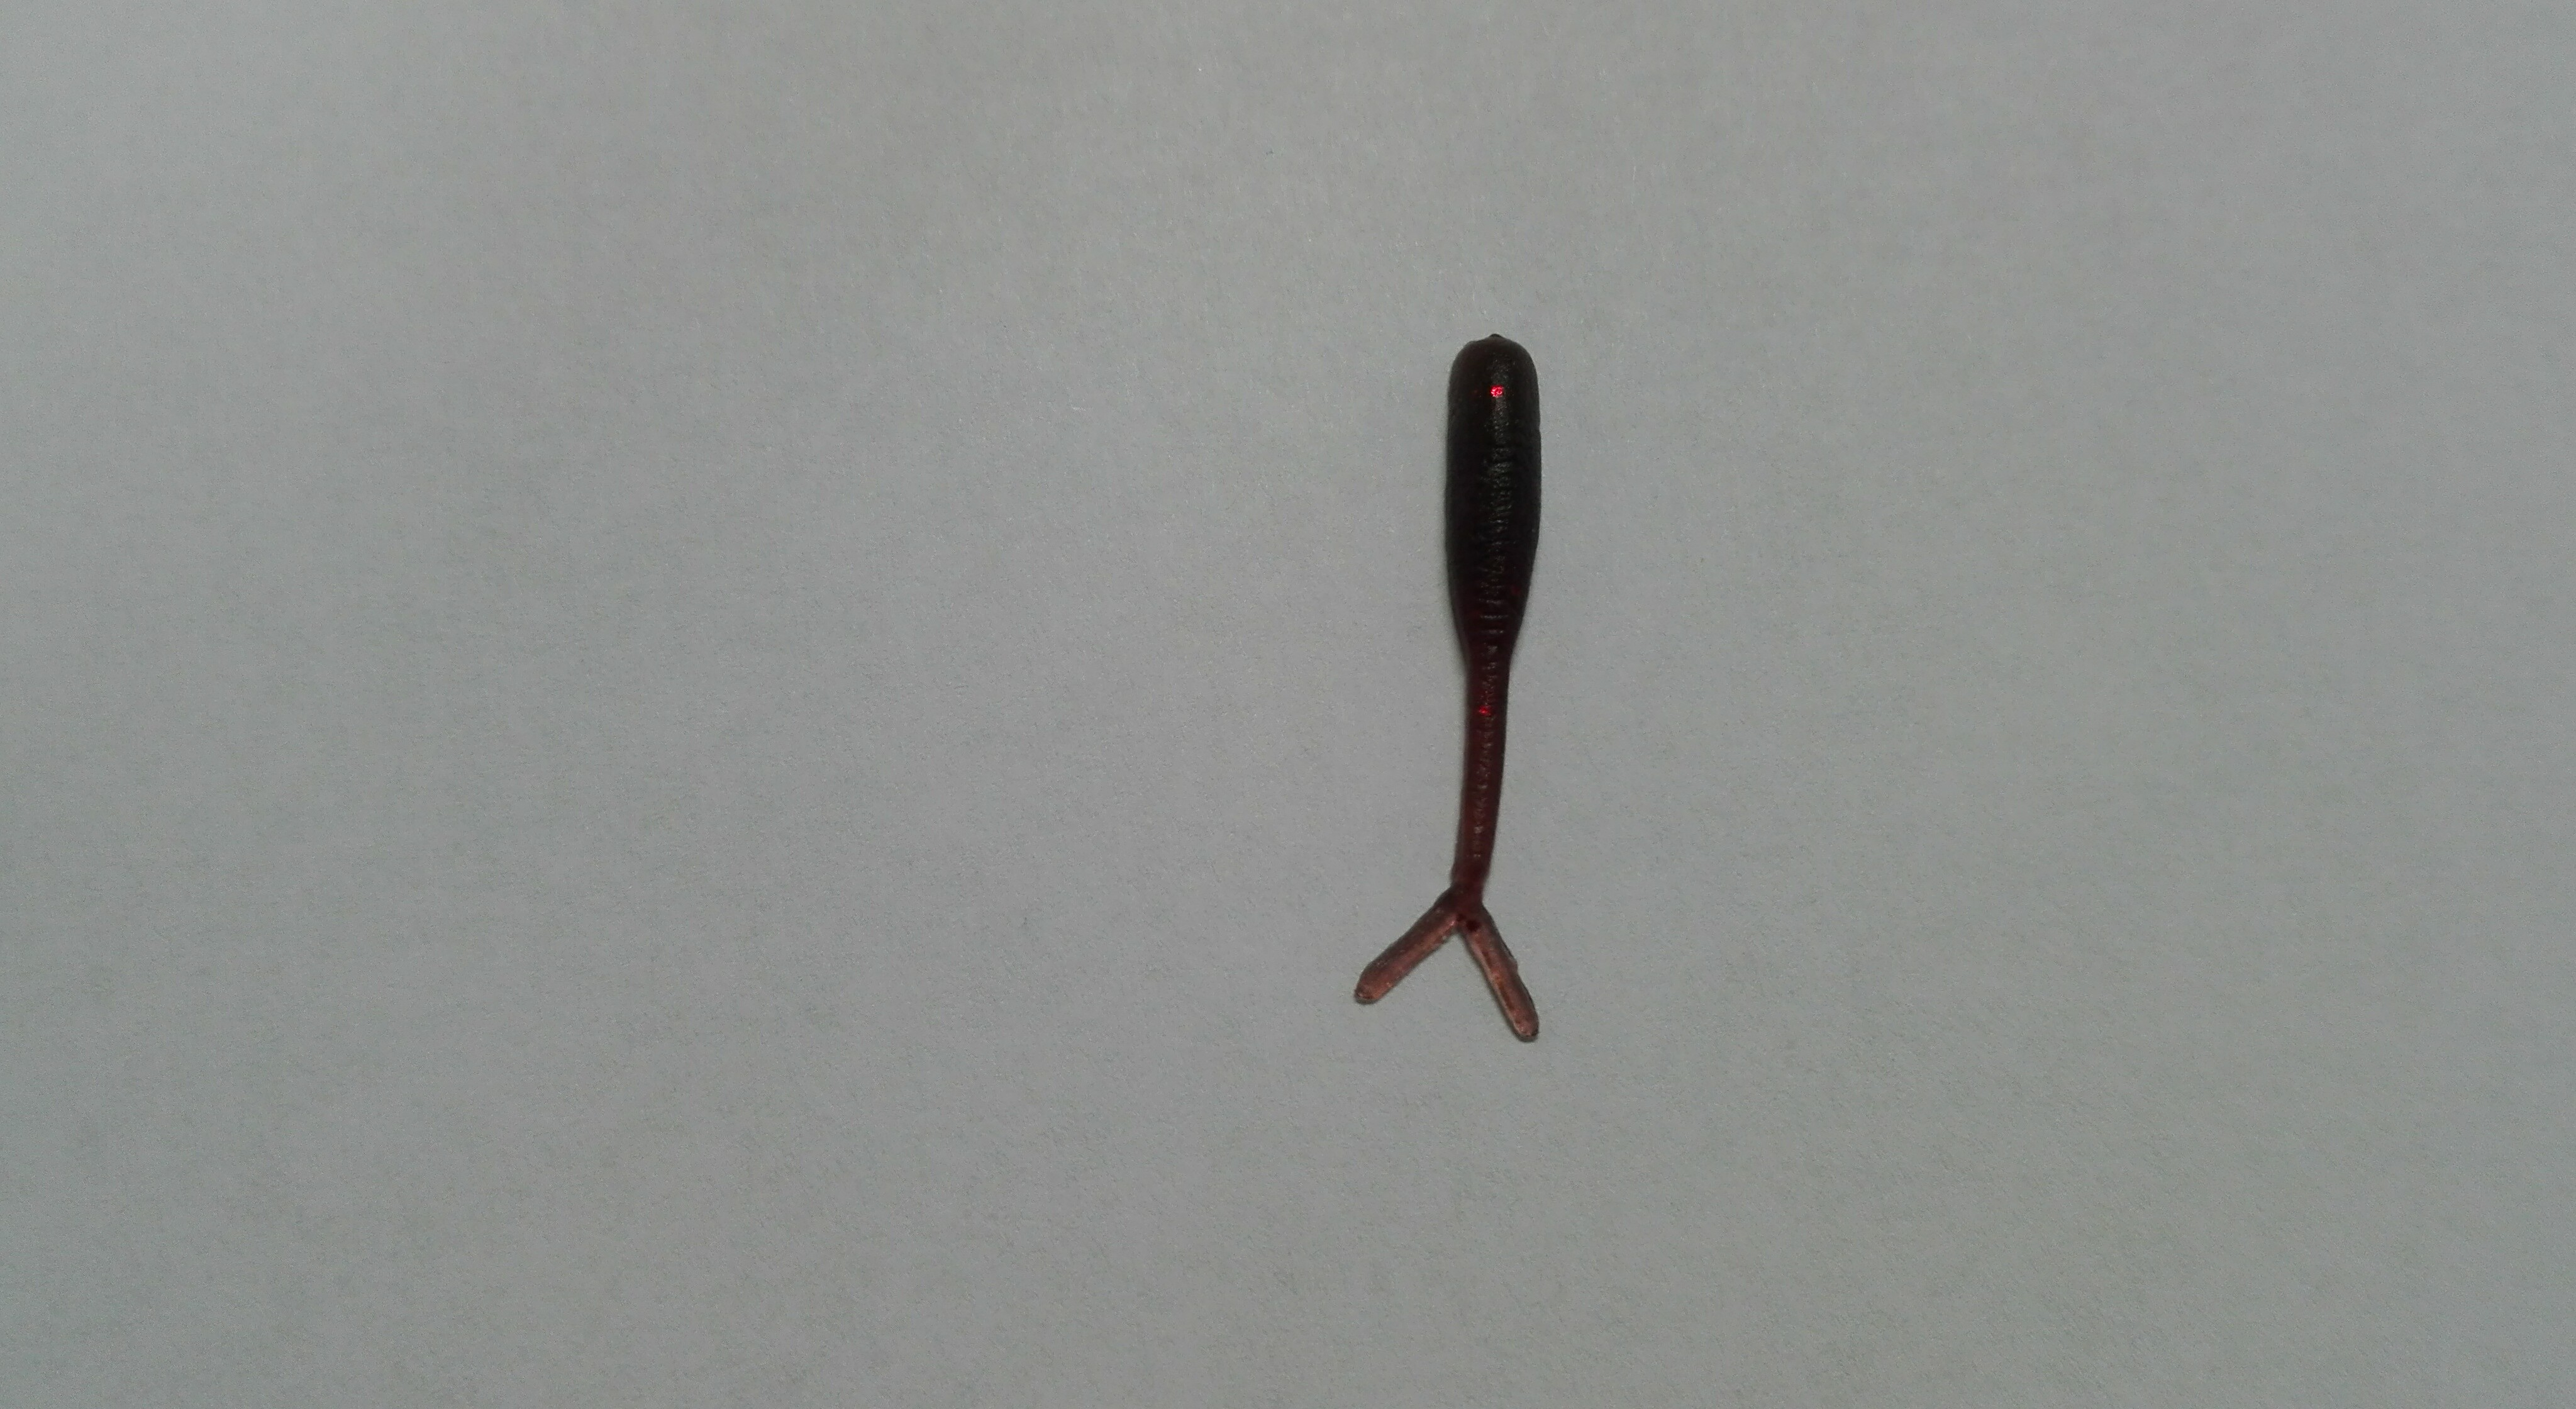 Smáček mini 2,5 cm Barva: 5 Hnědá červený glitr